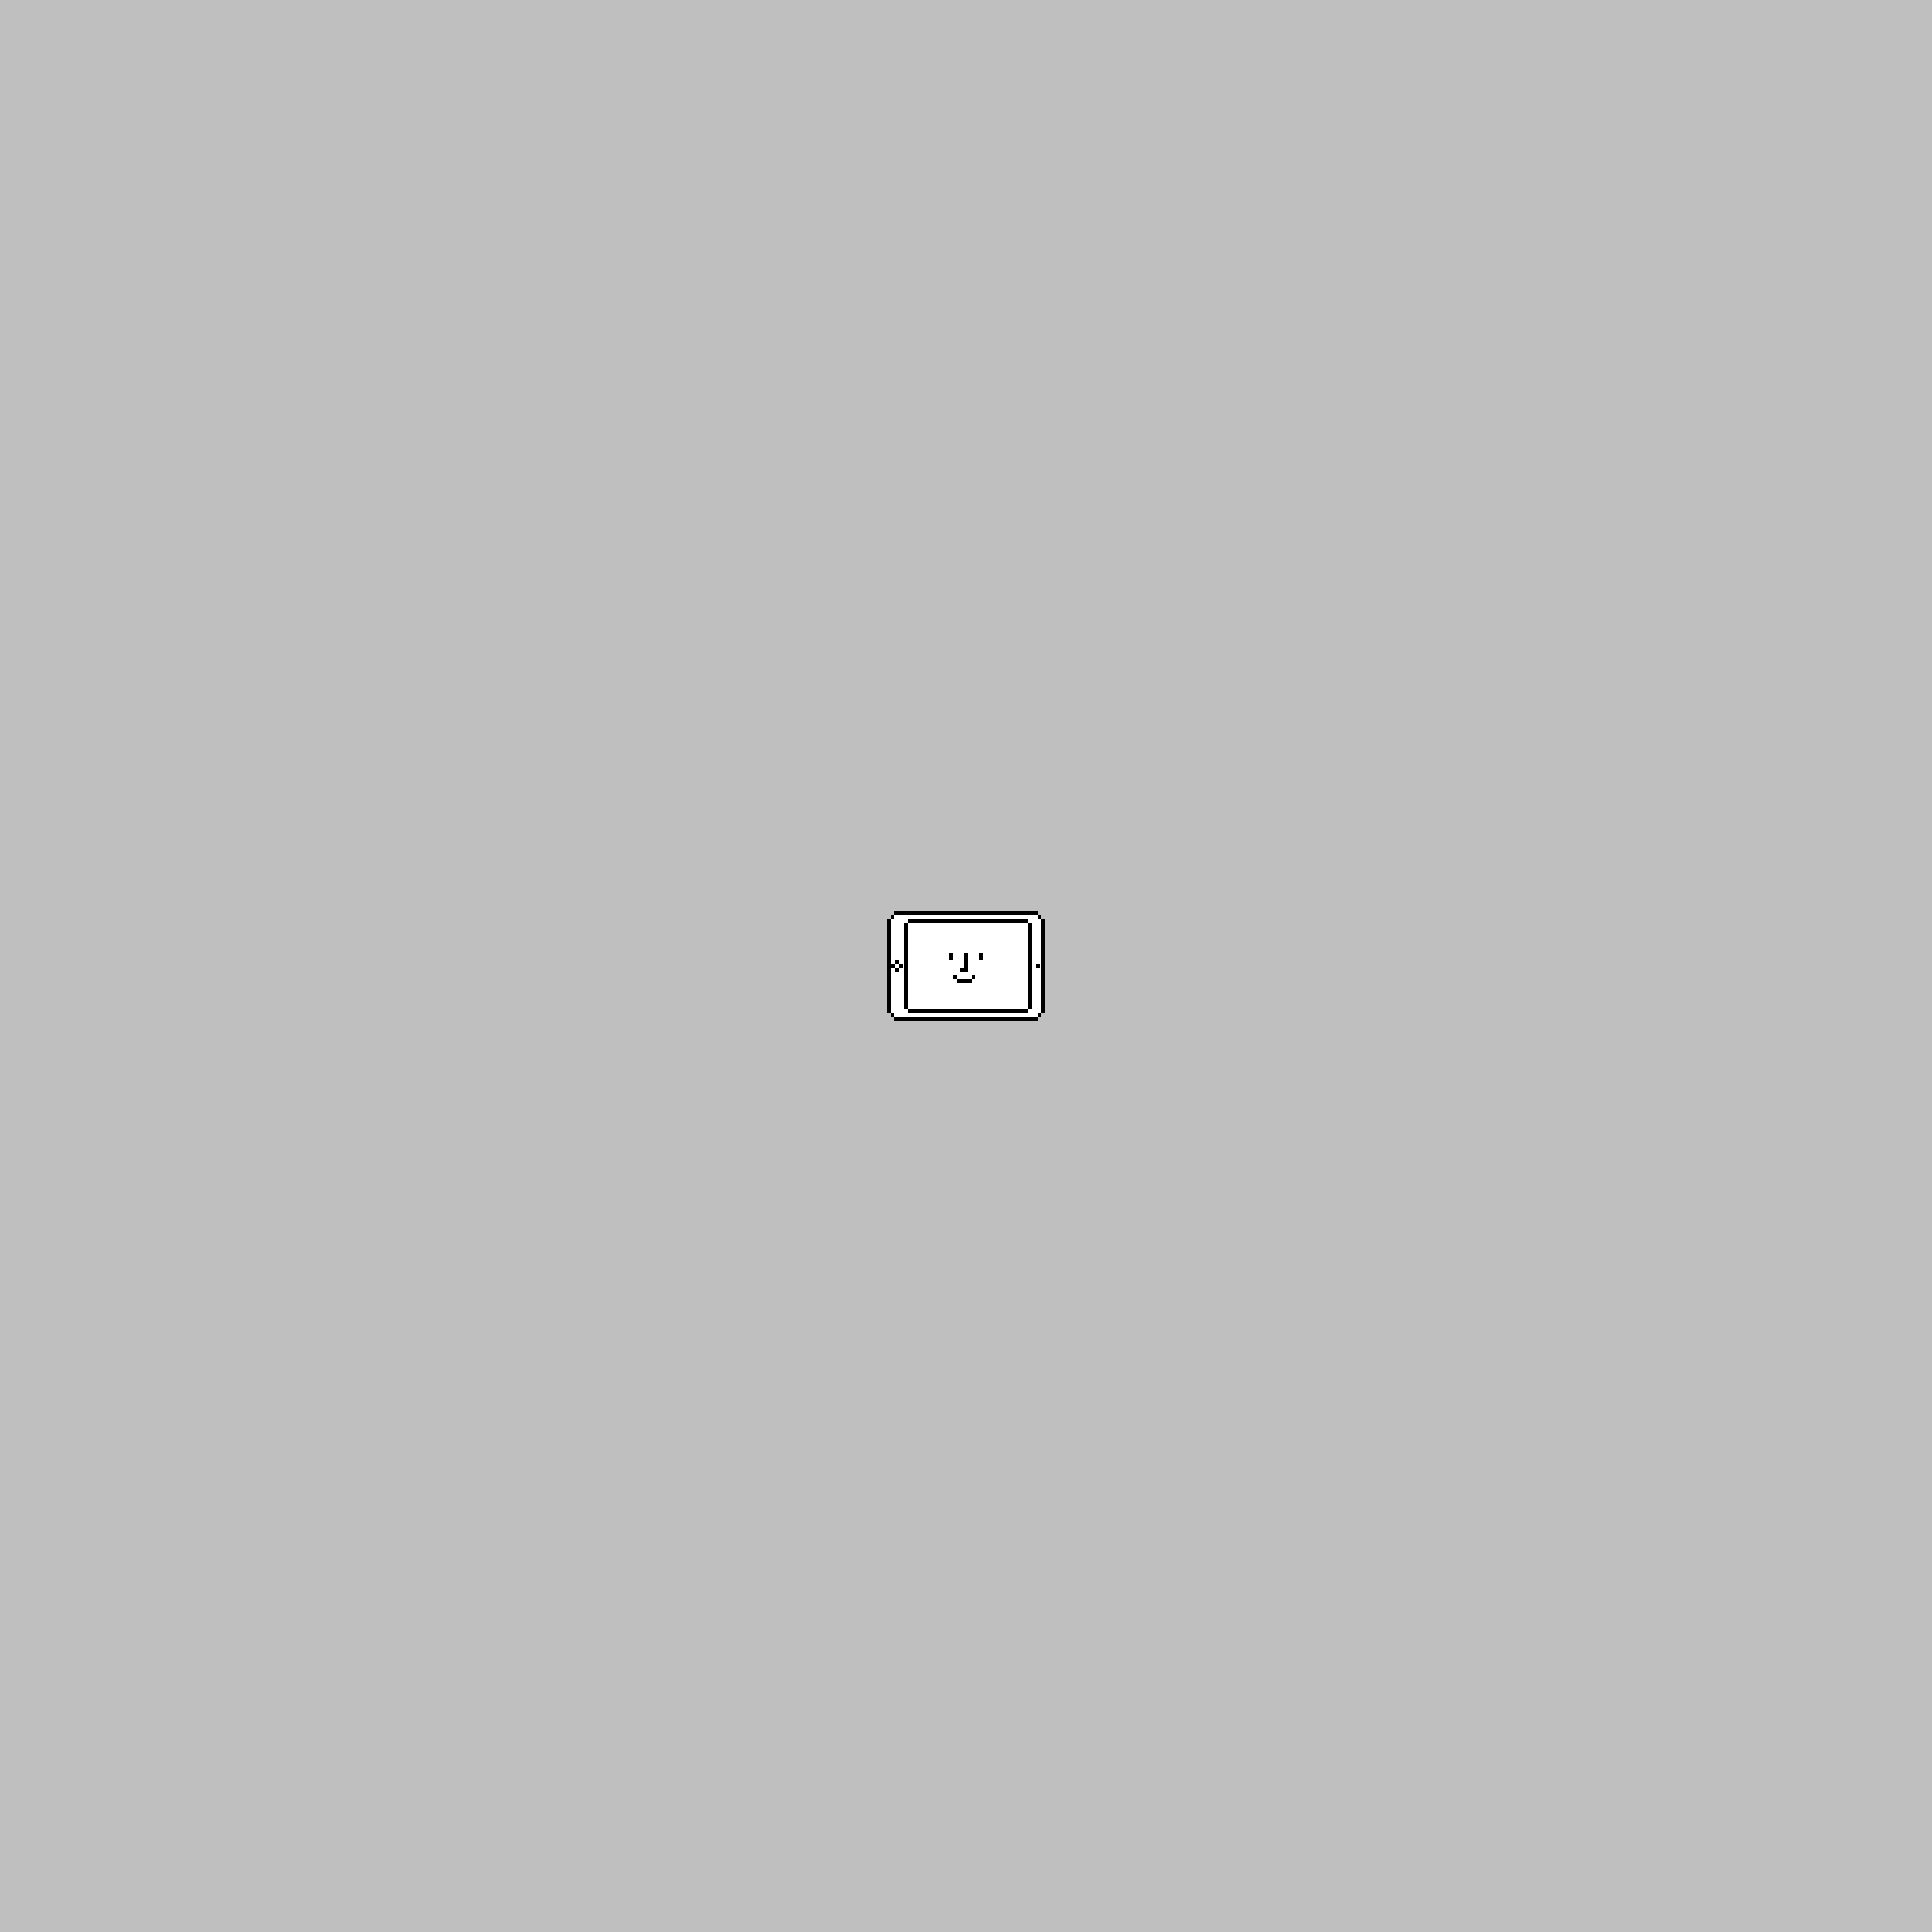 iPad miniロック画面ランドスケープ用壁紙